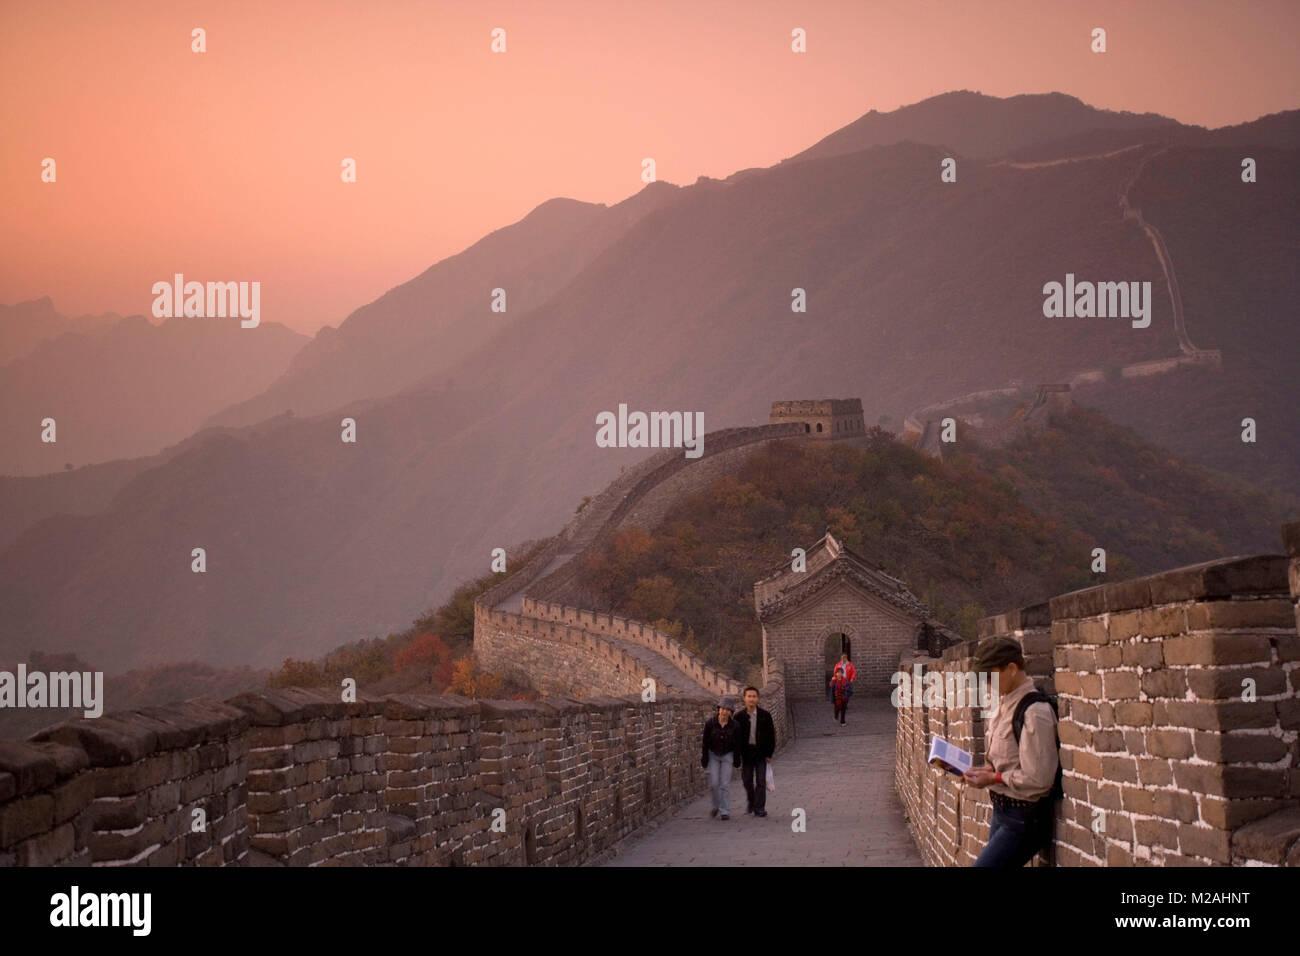 La Chine. Mutianyu, près de Beijing. La Grande Muraille. UNESCO World Heritage site. Les touristes. Photo Stock